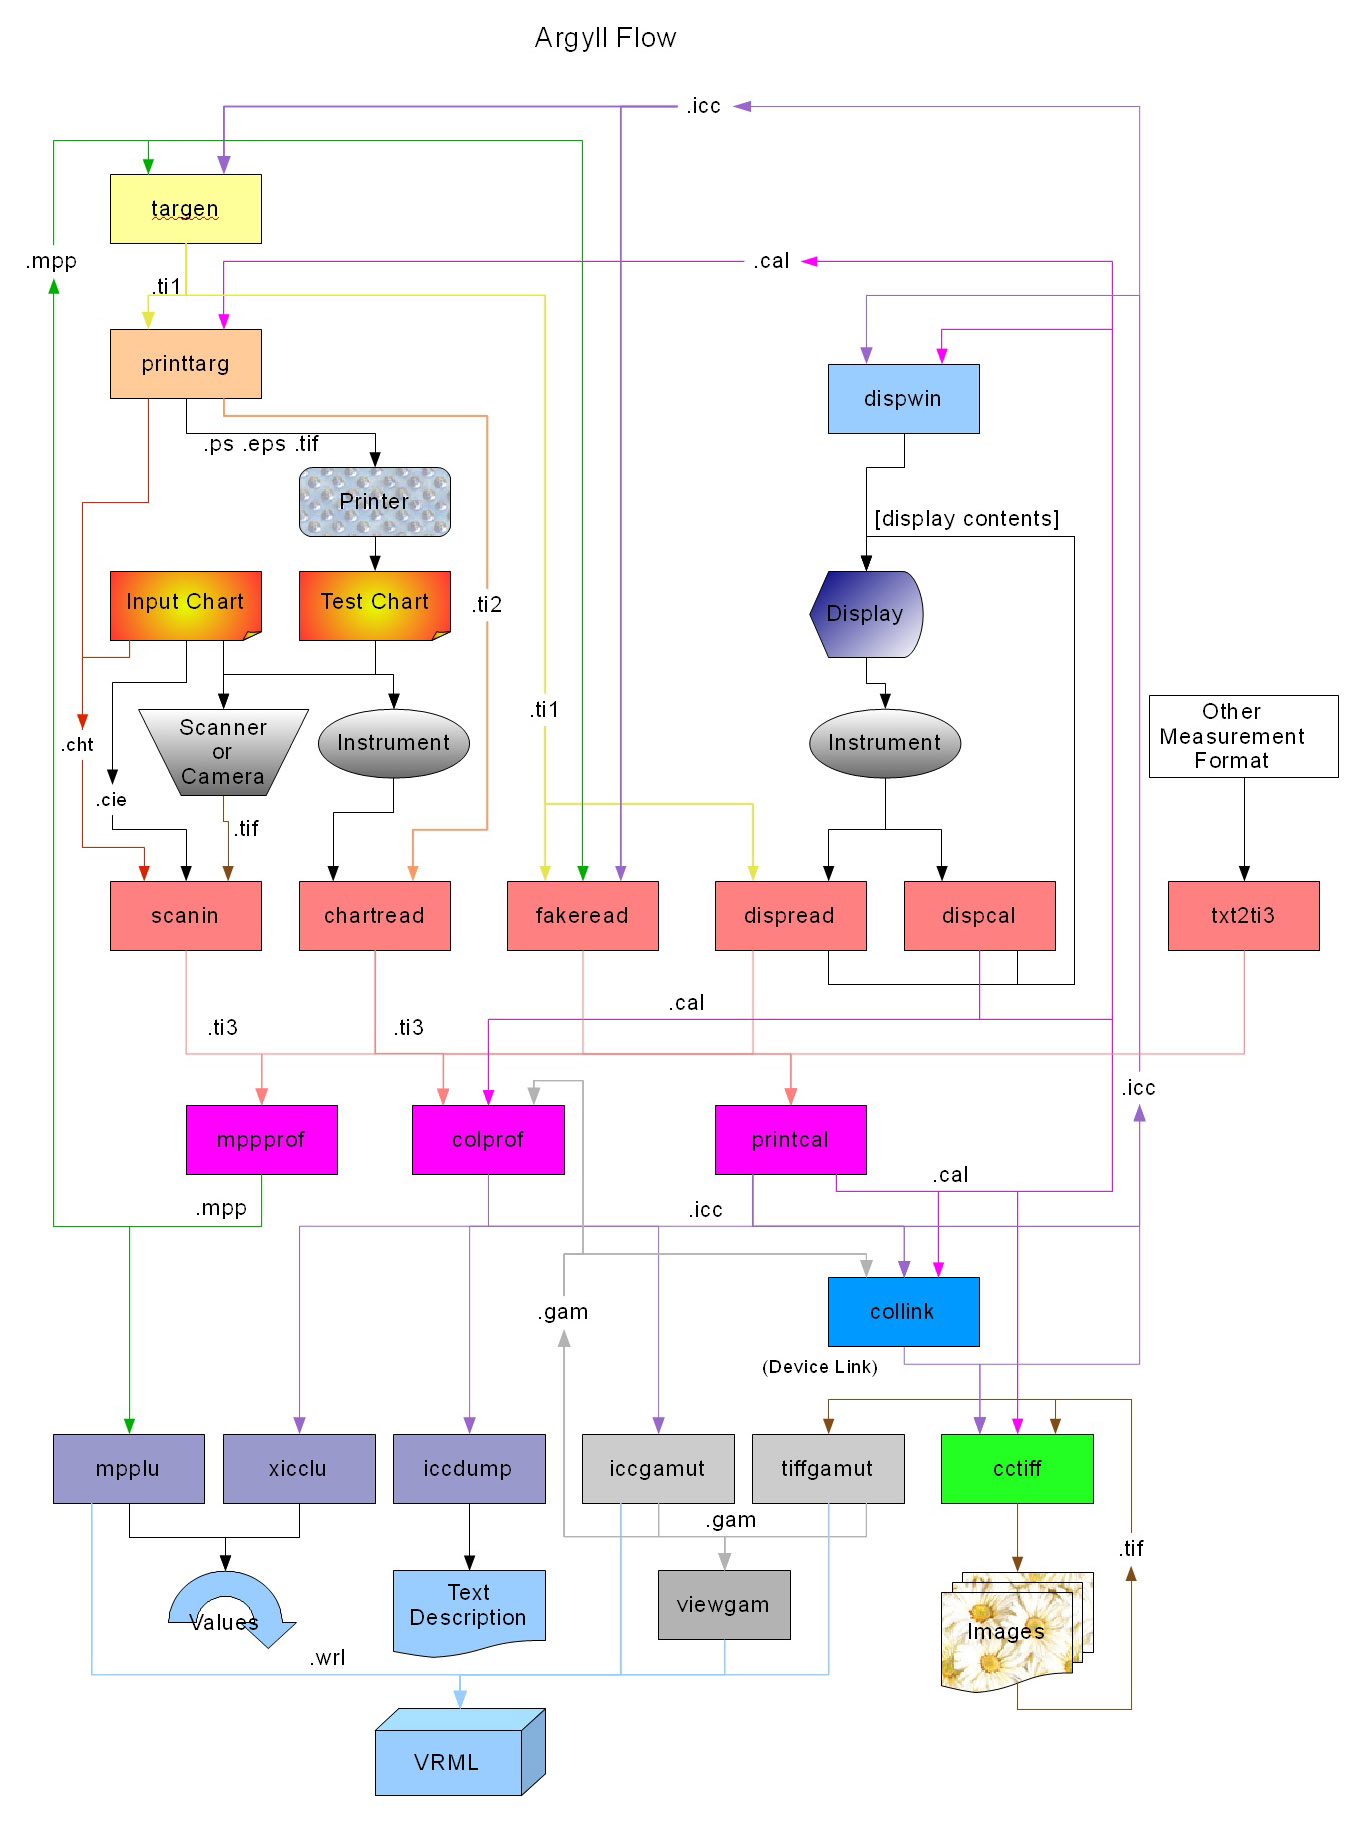 microsoft flowchart template .